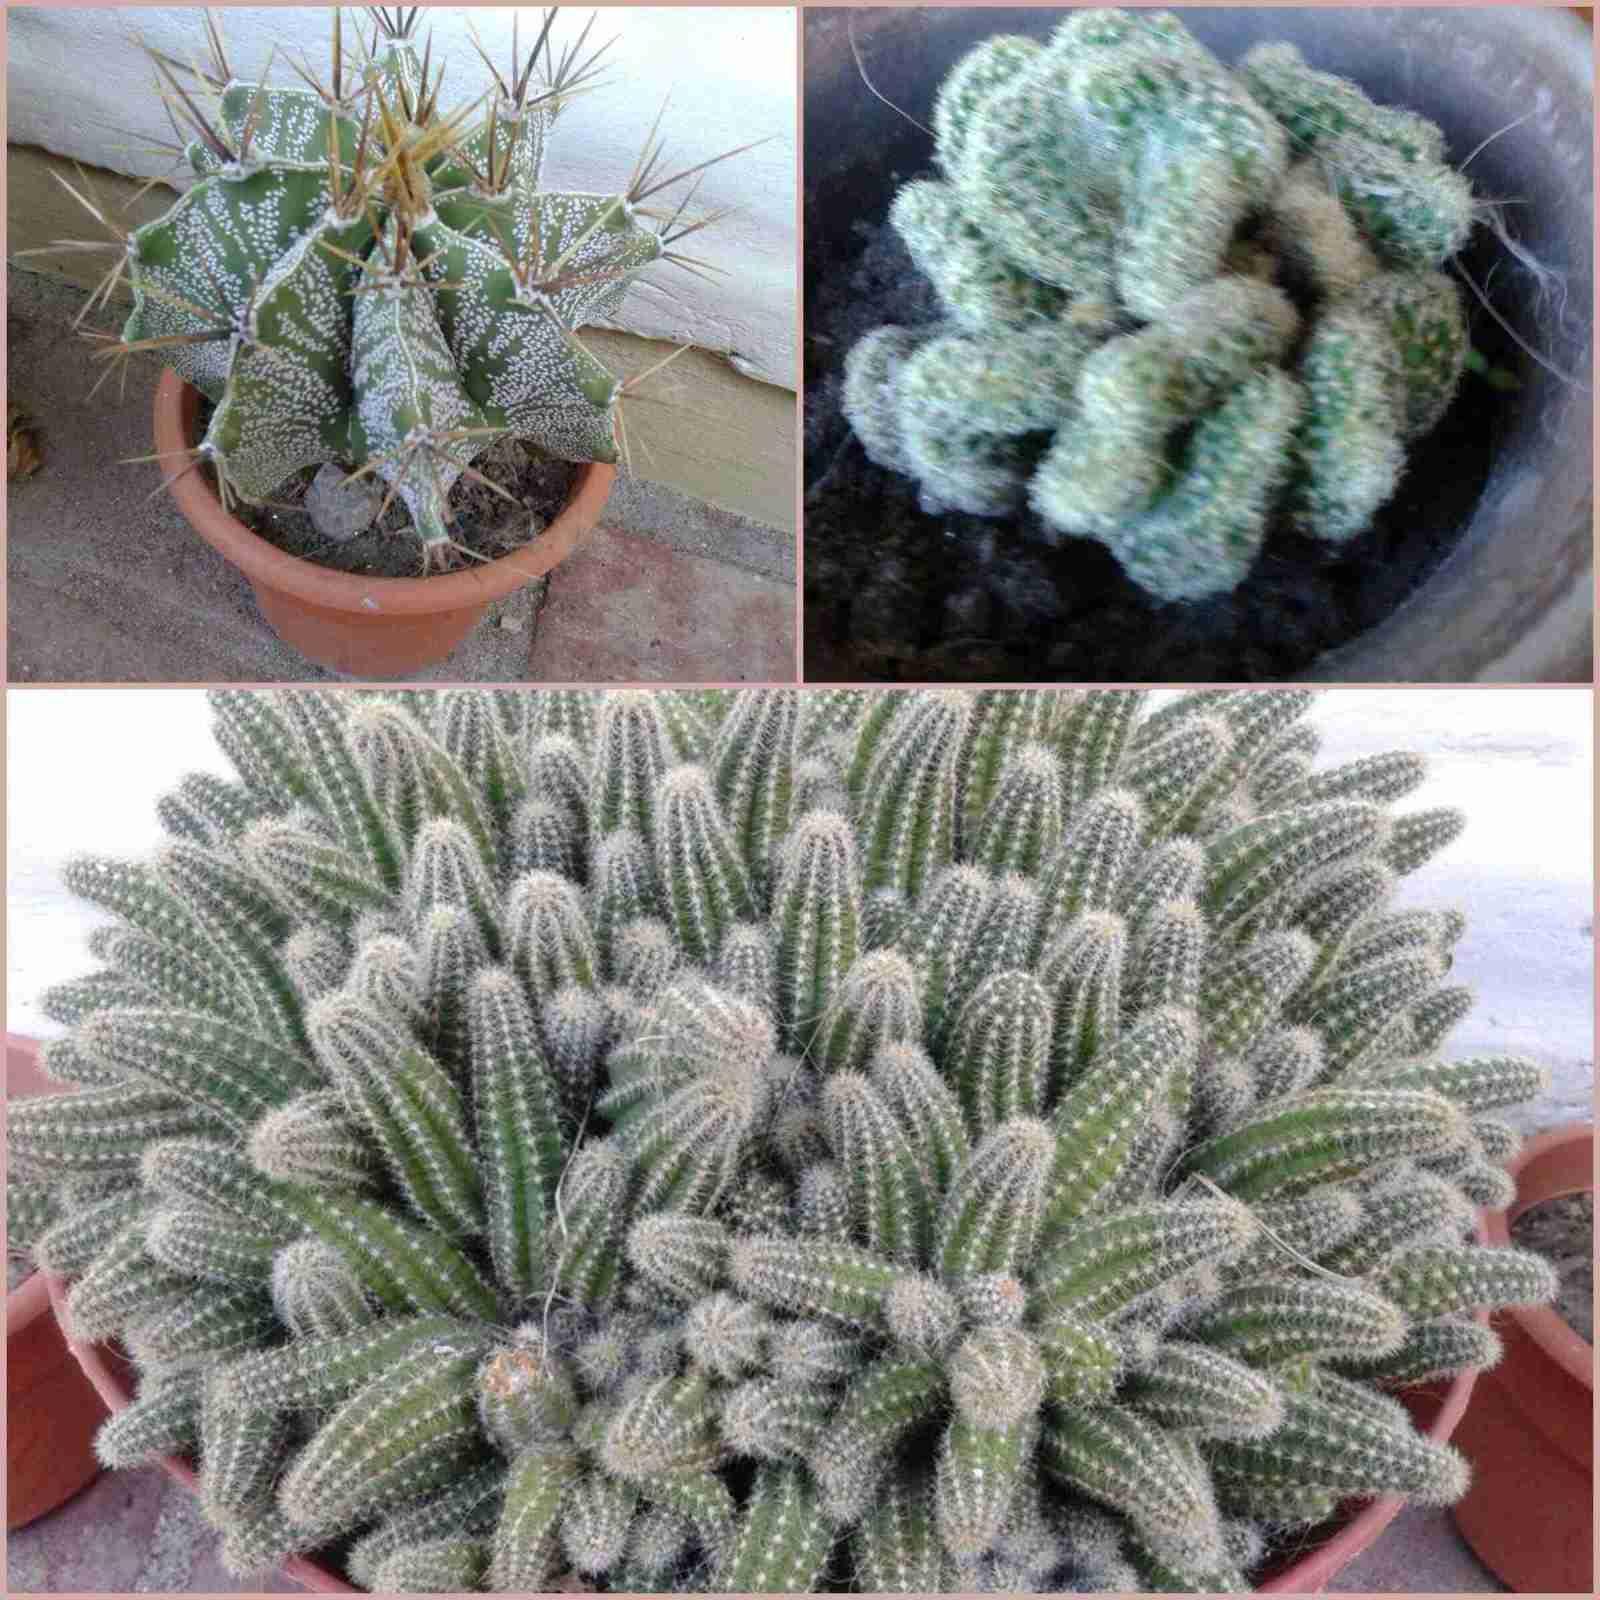 Astrophytum Ornatum de Maria Angeles y mas - Mis Plantas, Tus Plantas 1